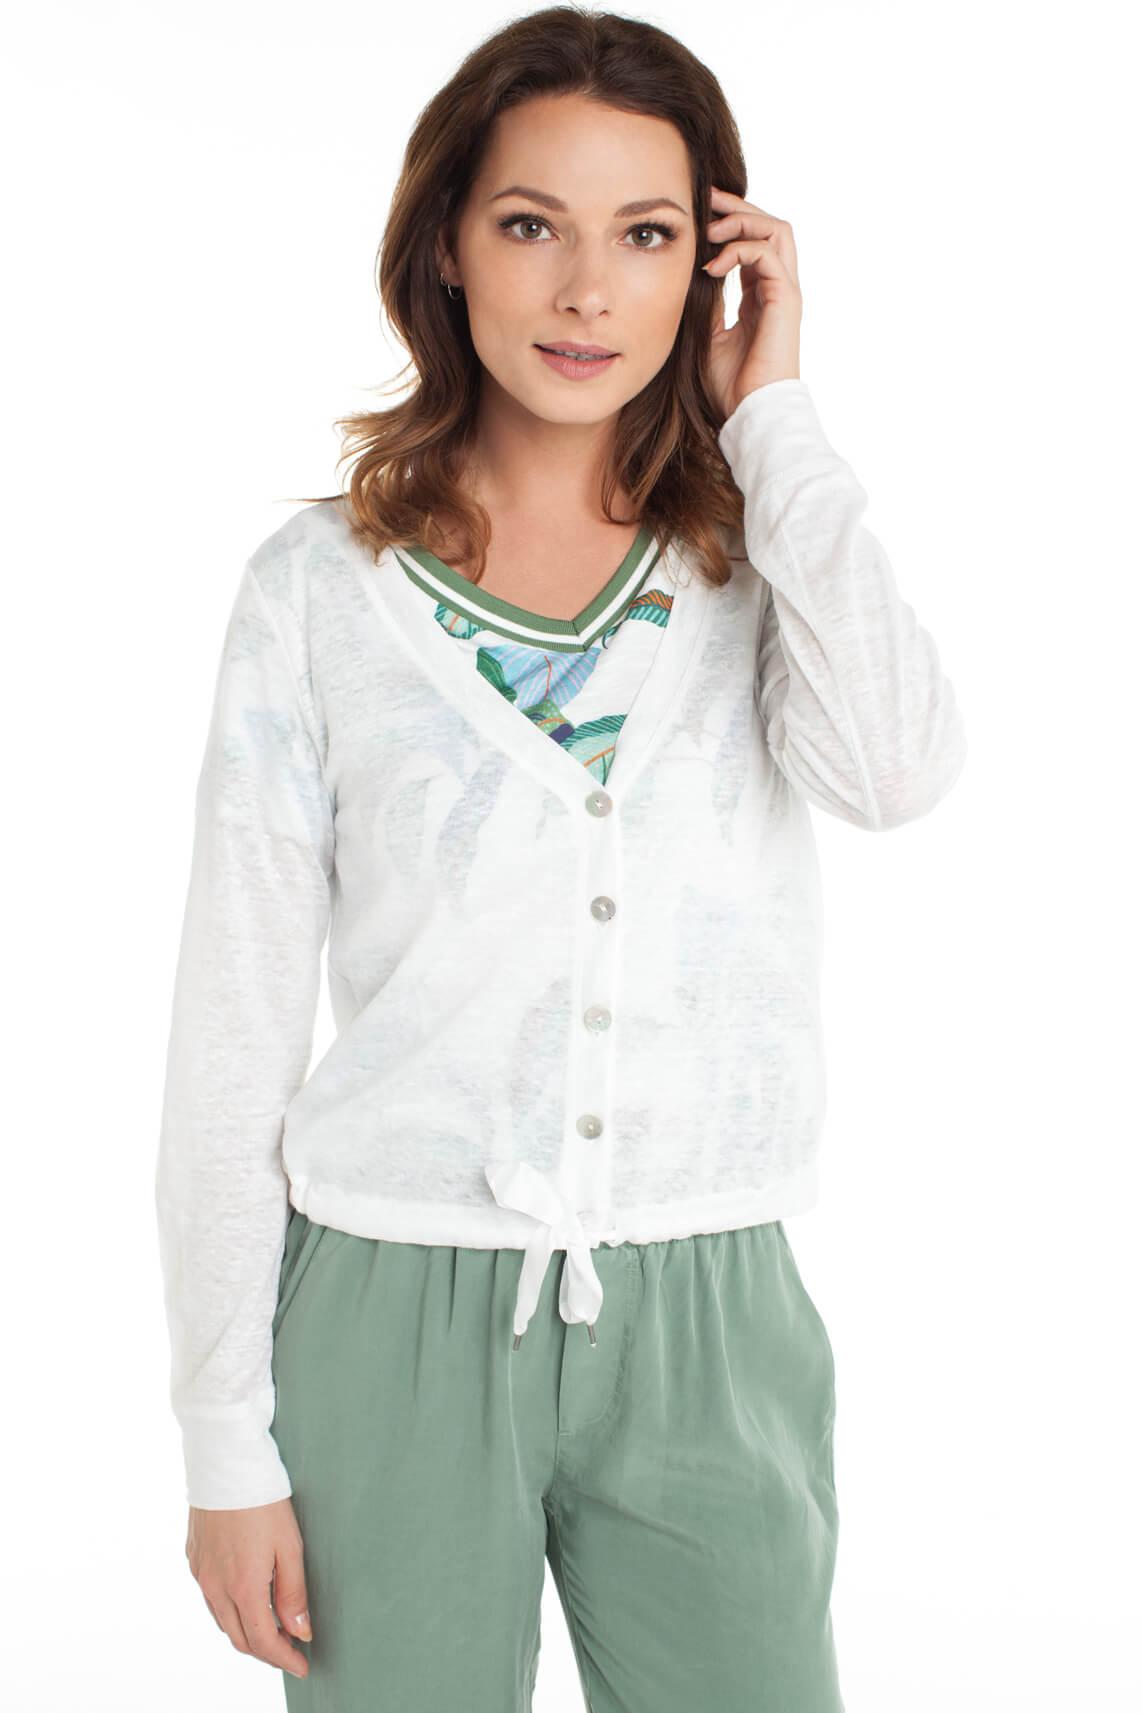 Anna Blue Dames Linnen vestje met knopen wit